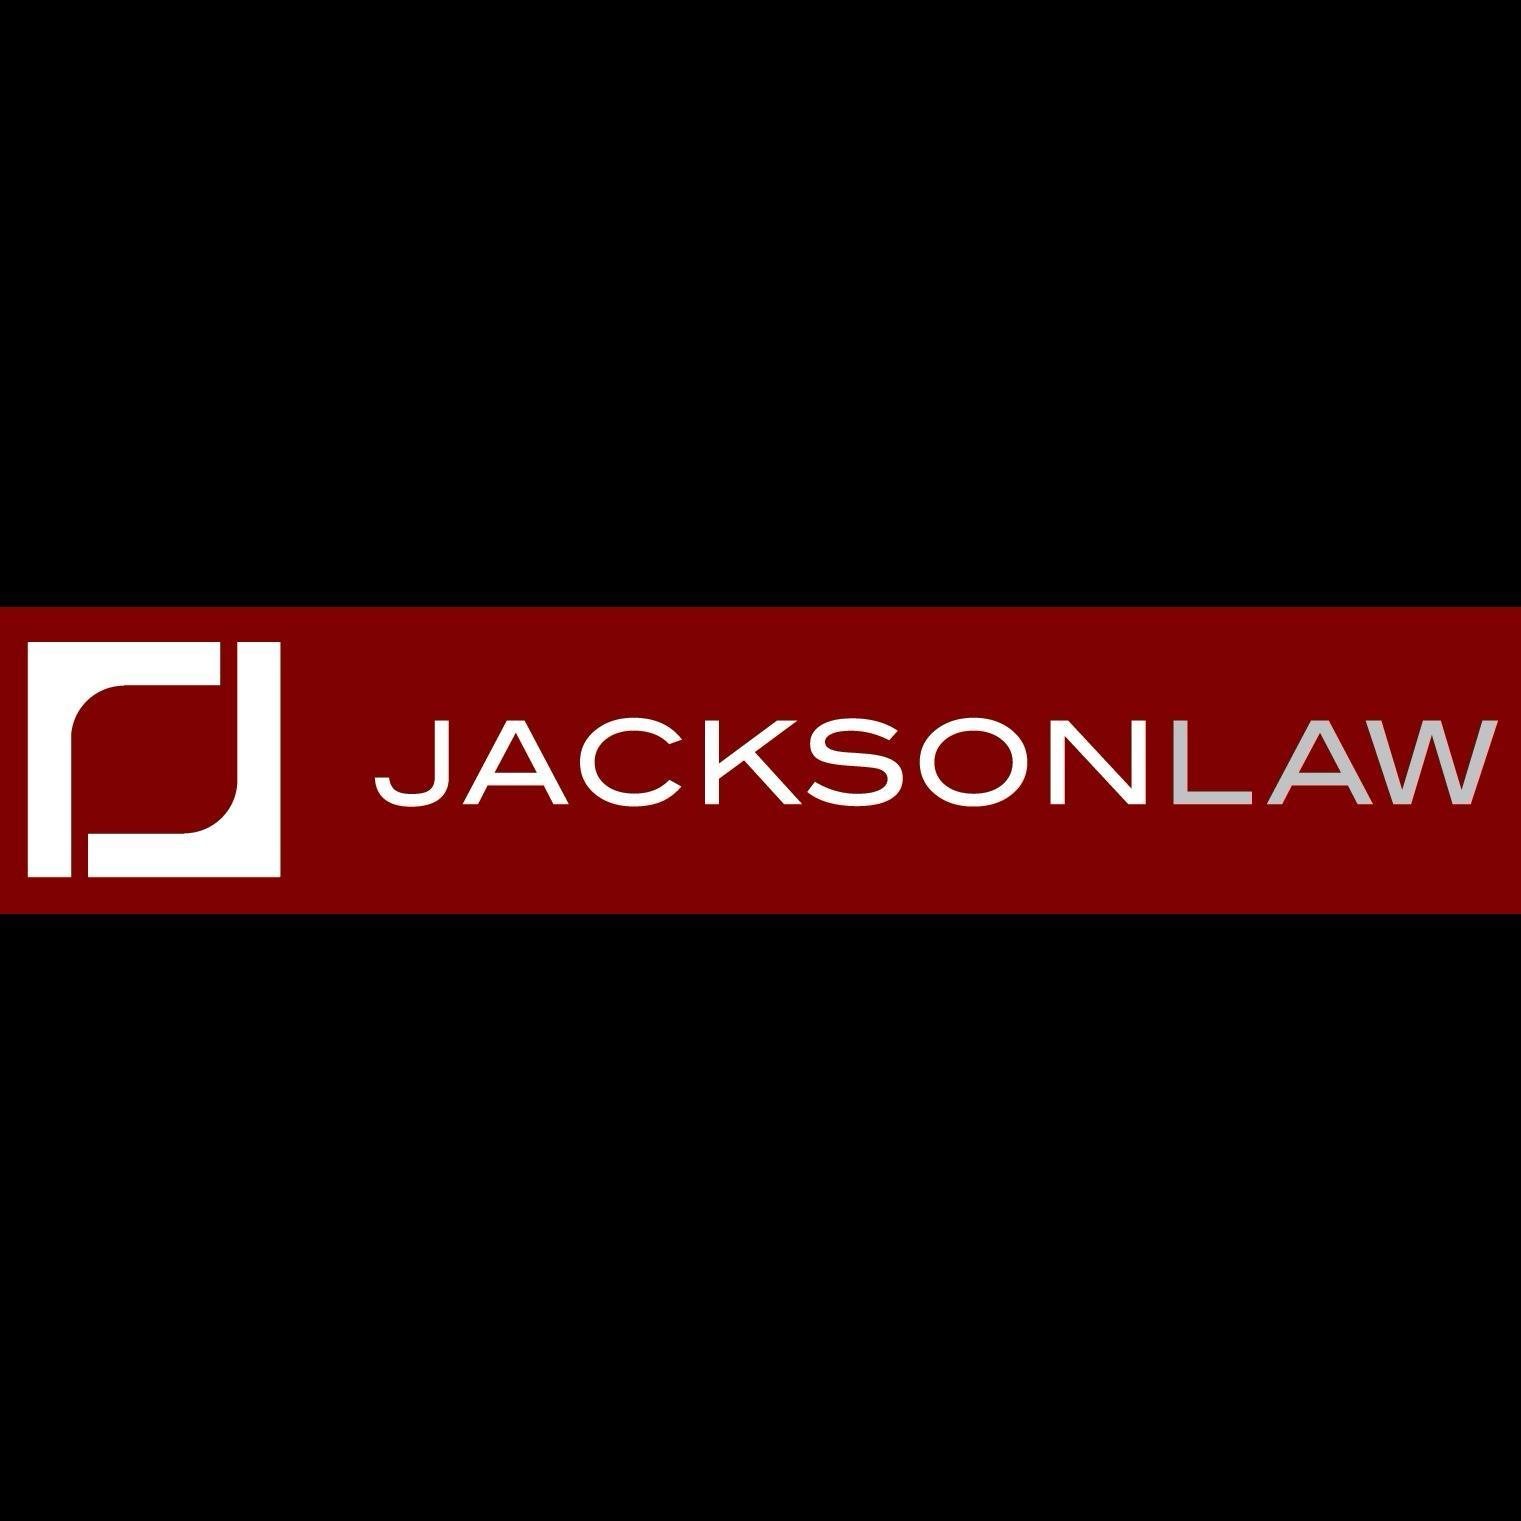 Jackson Law